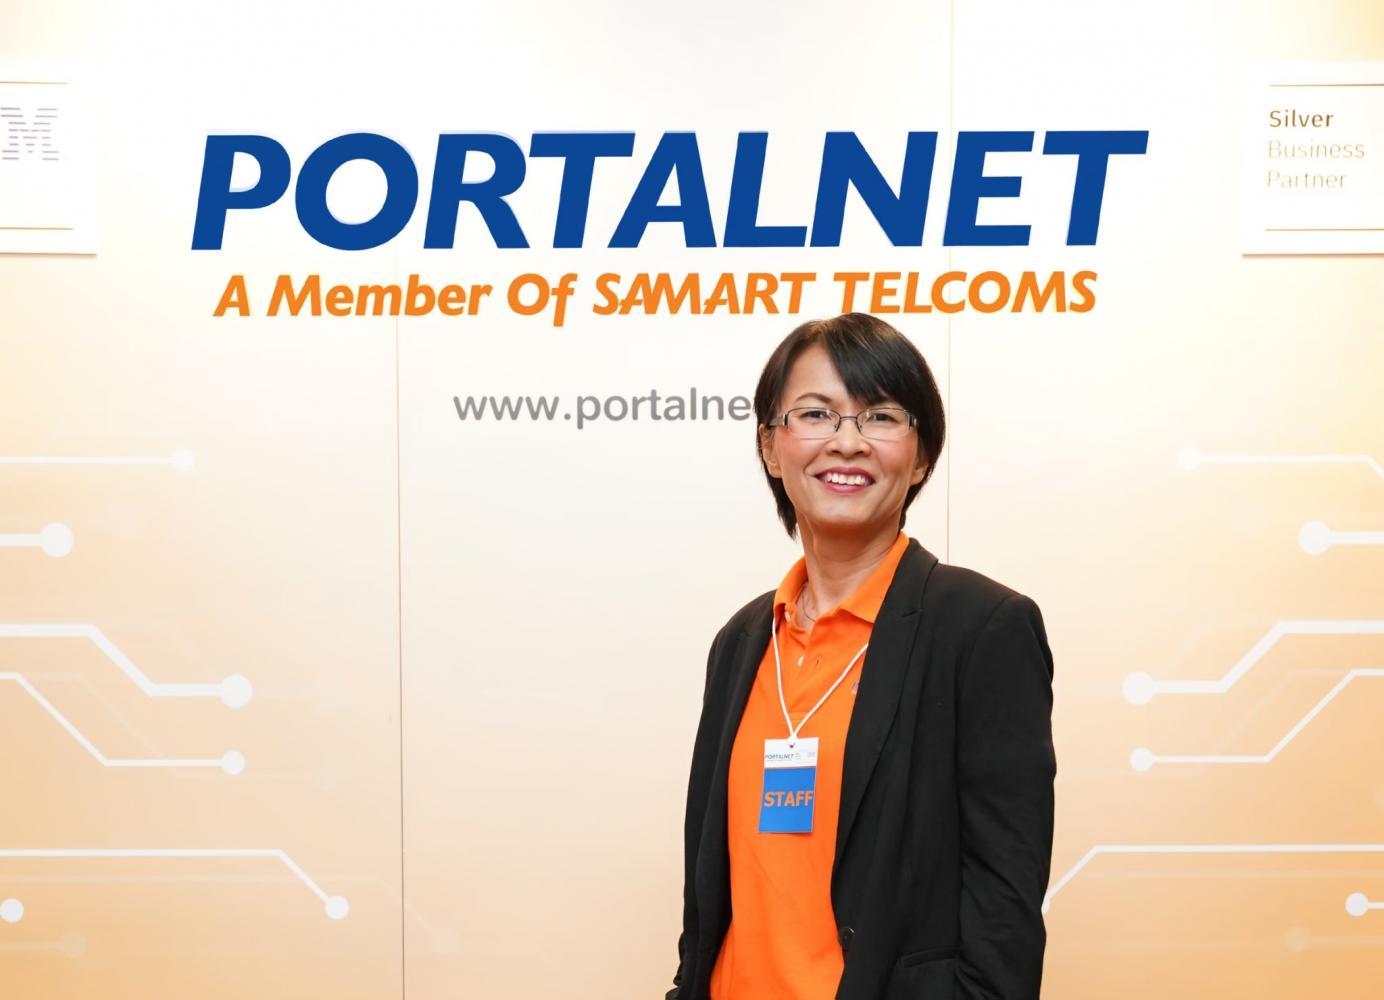 Portalnet, IBM help firms speed up digital strategies